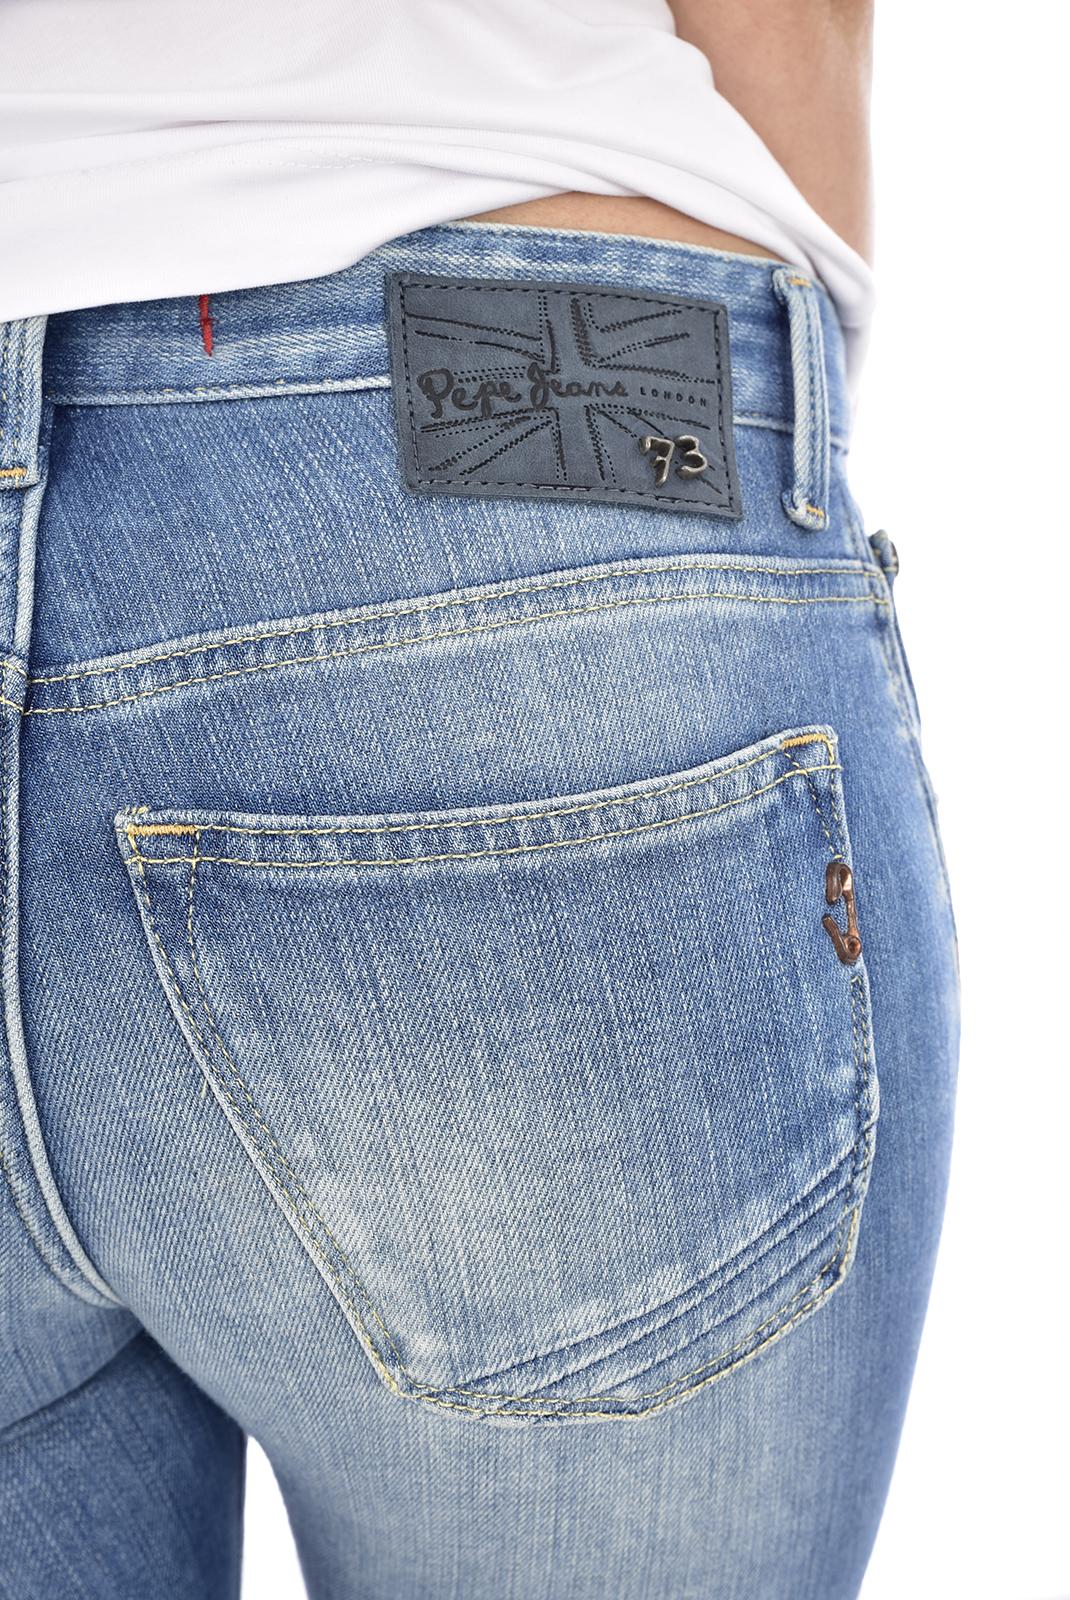 Jeans   Pepe jeans PL2012648 jemina beu